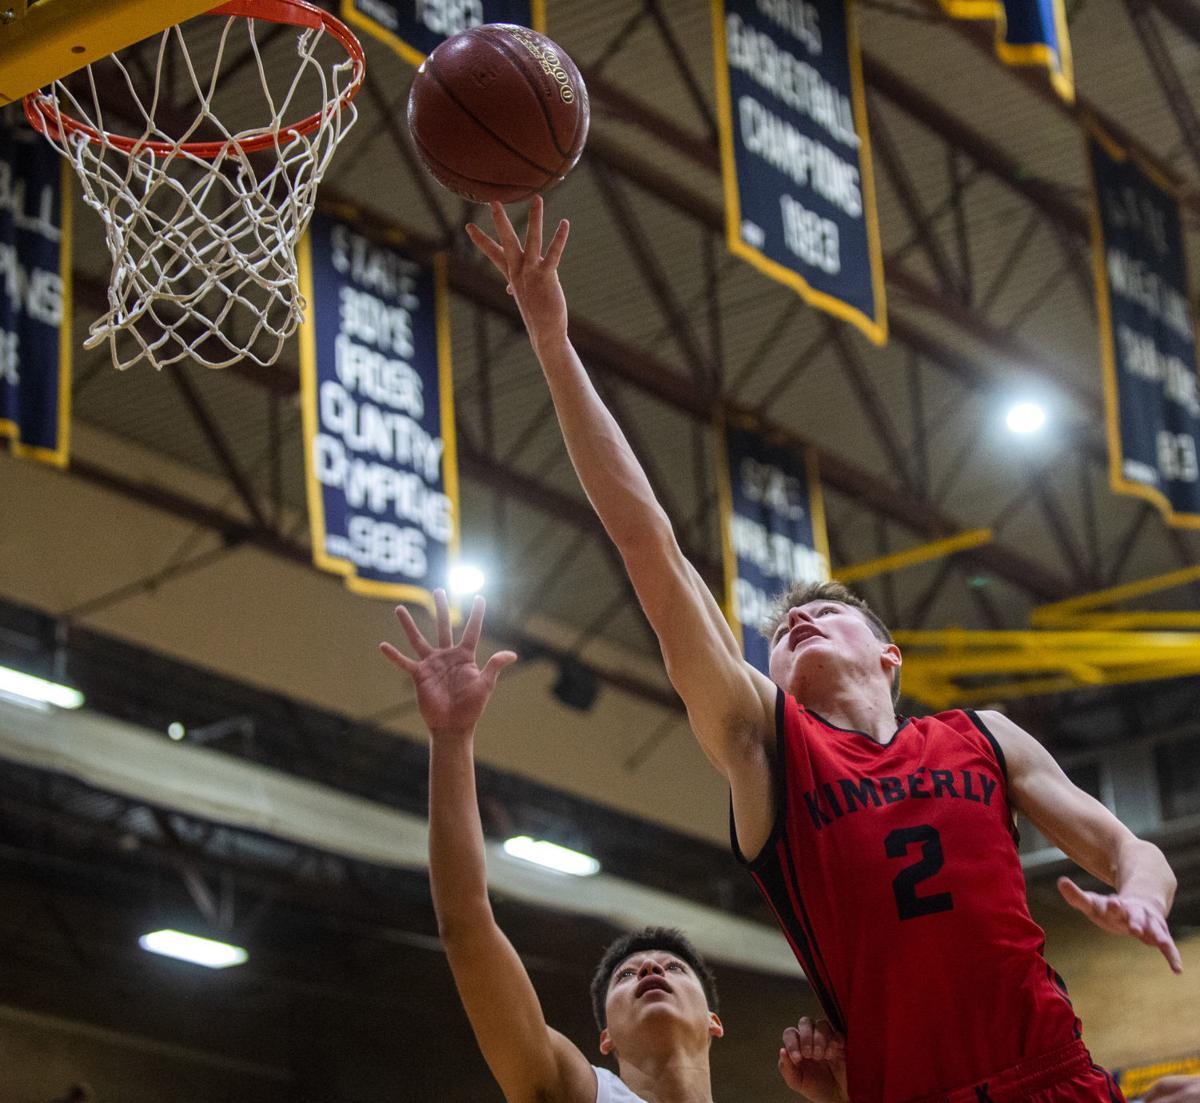 Kimberly vs. Fruitland boys state basketball